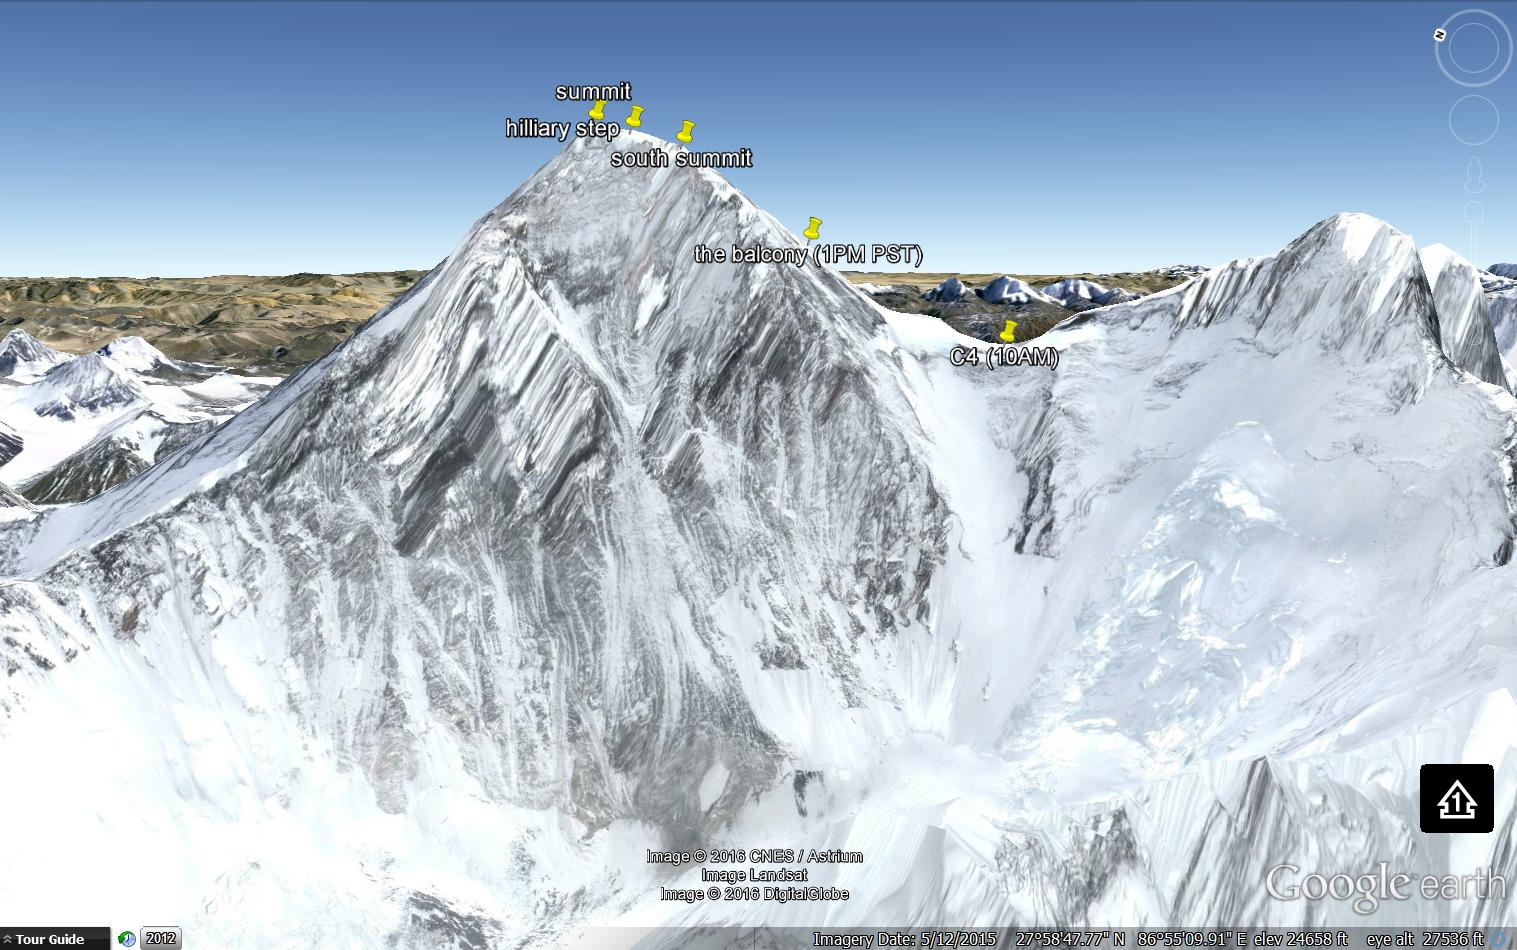 Go Colin Go! Thanks Caitlin Alcott, Colin's sister, for the incredible Google Earth pics!